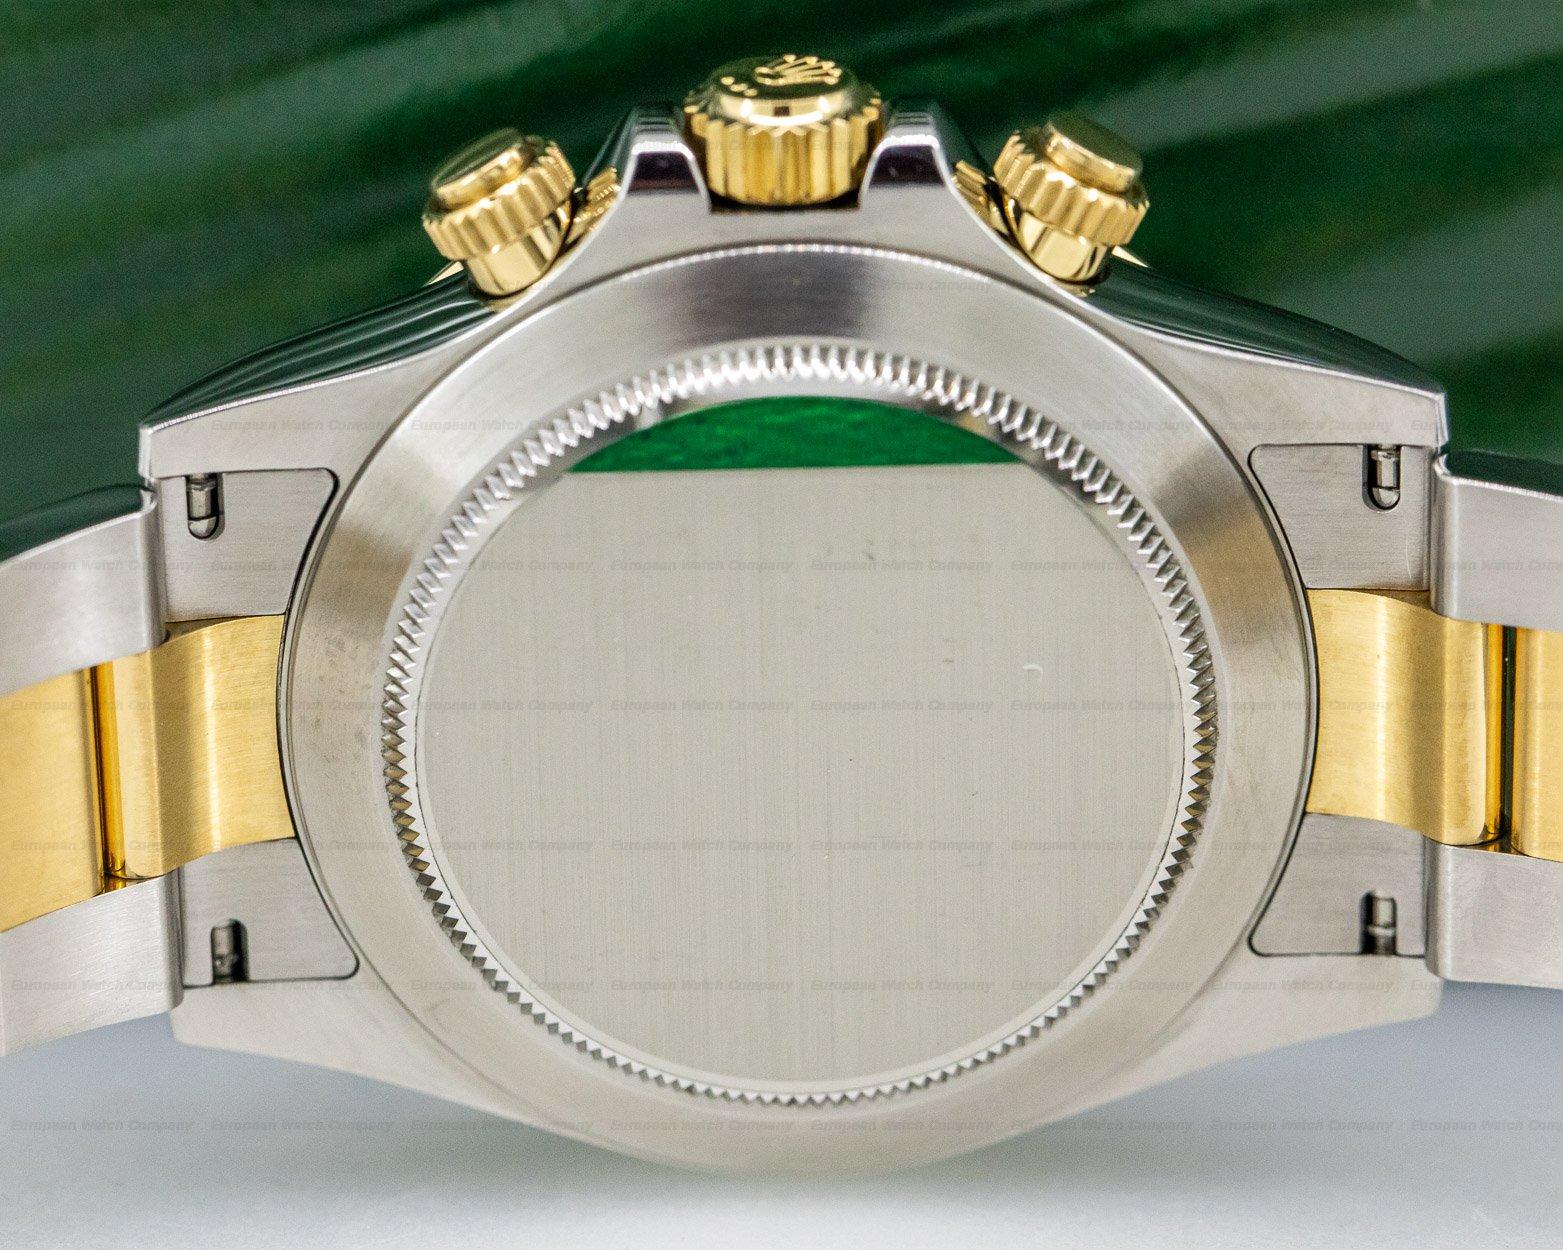 Rolex 116503 Daytona Slate Grey Dial 18K Yellow Gold / SS